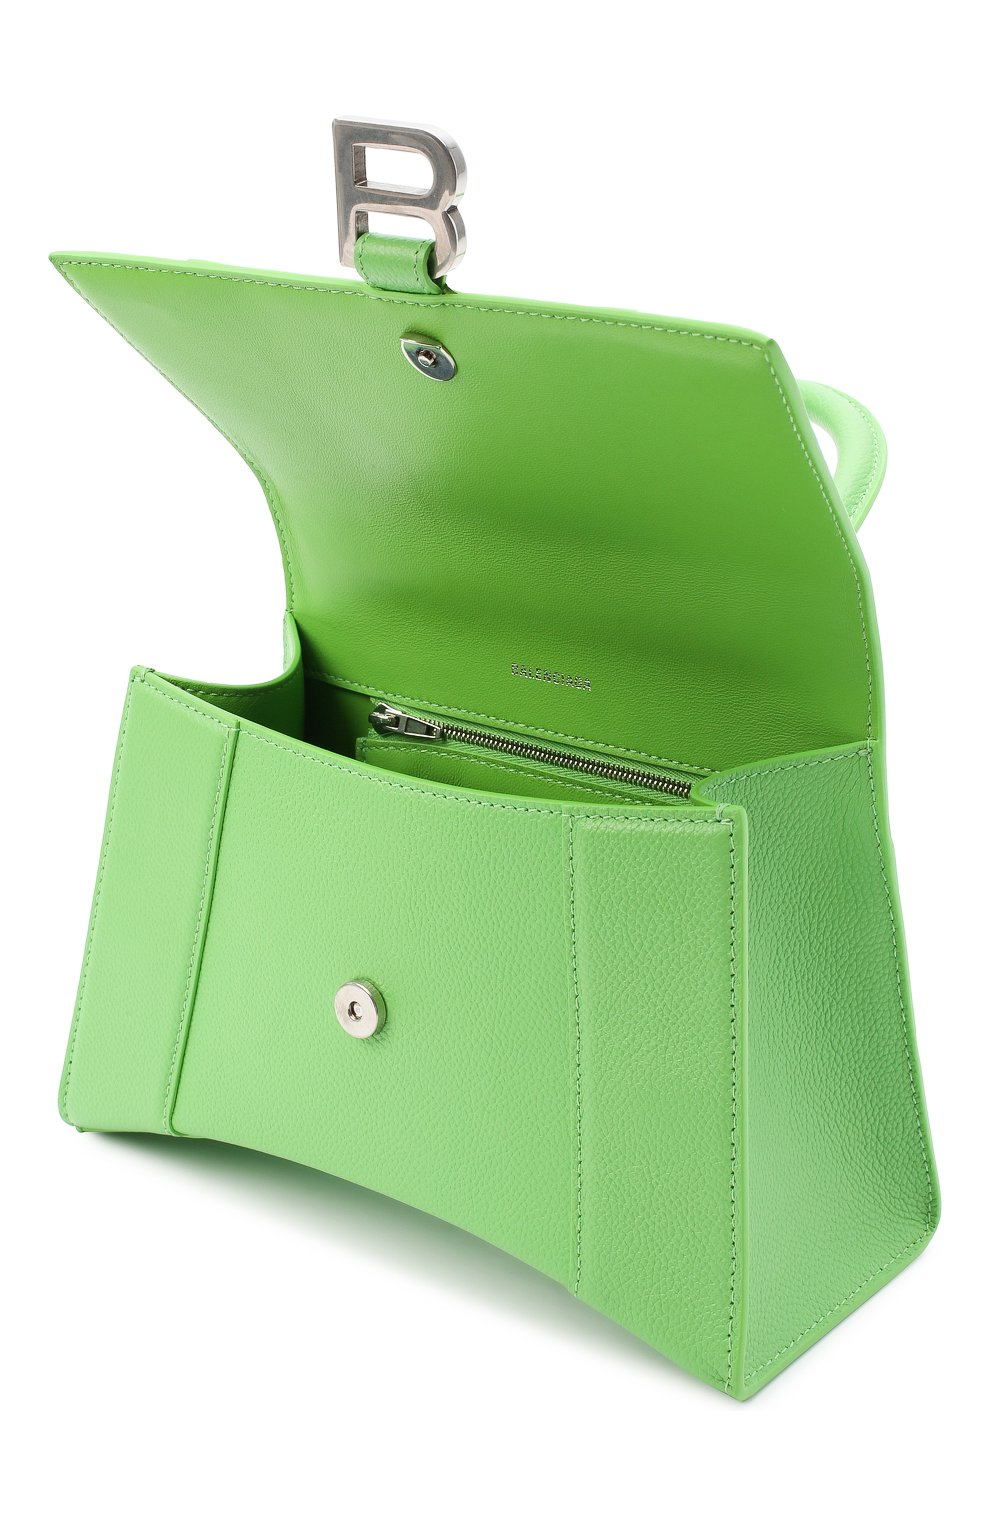 Женская сумка hourglass s BALENCIAGA светло-зеленого цвета, арт. 593546/1IZHY | Фото 4